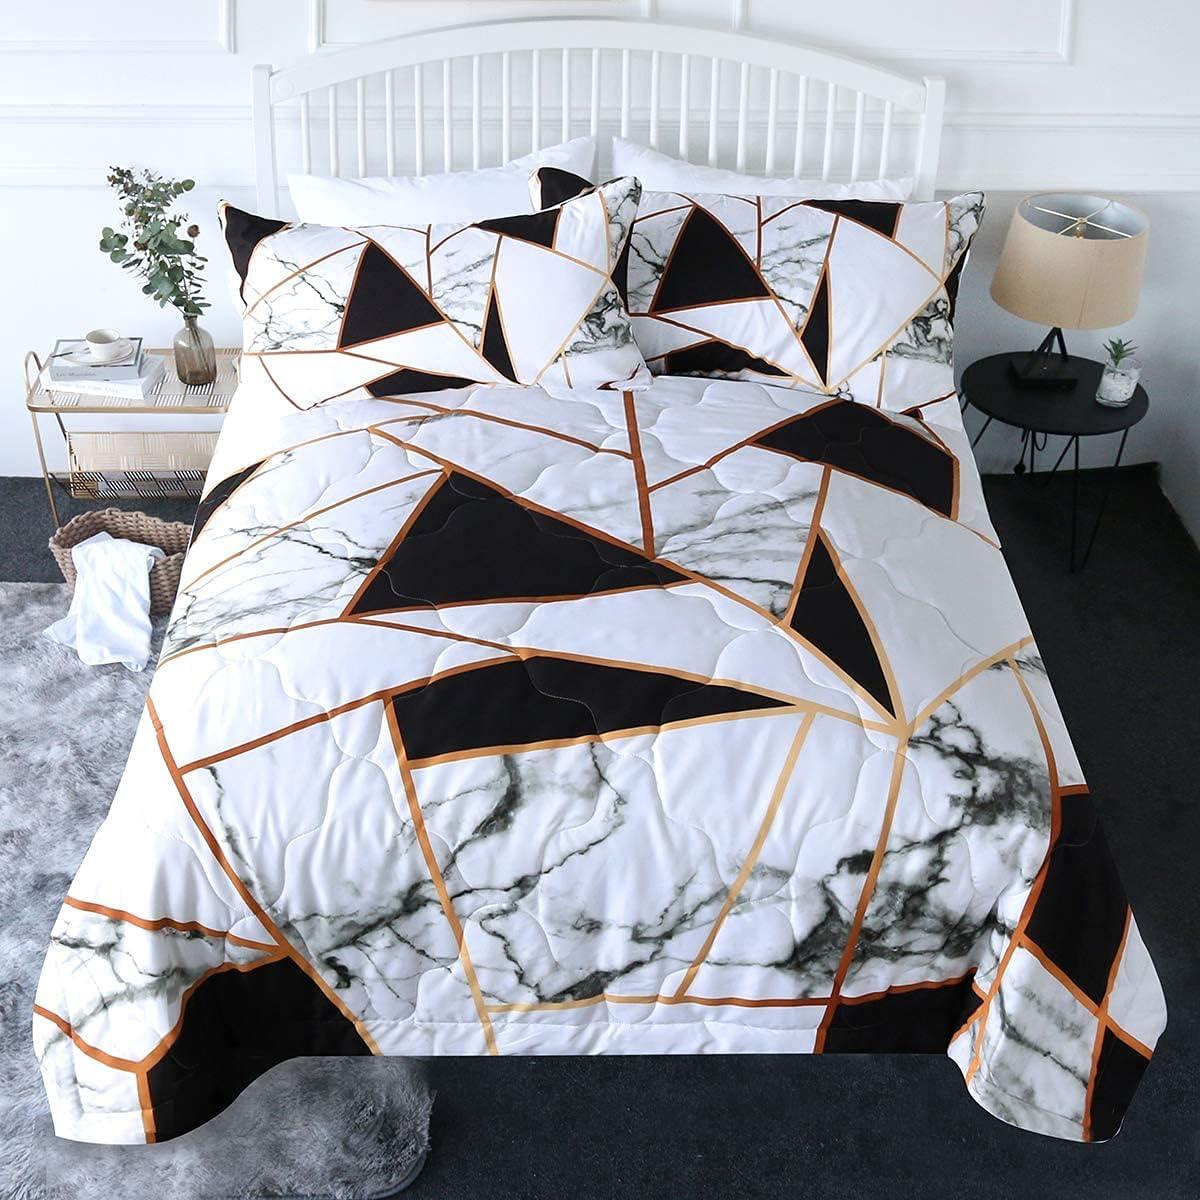 Blessliving Black Comforter Set Twin Quilt Spasm Columbus Mall price S Bedding White